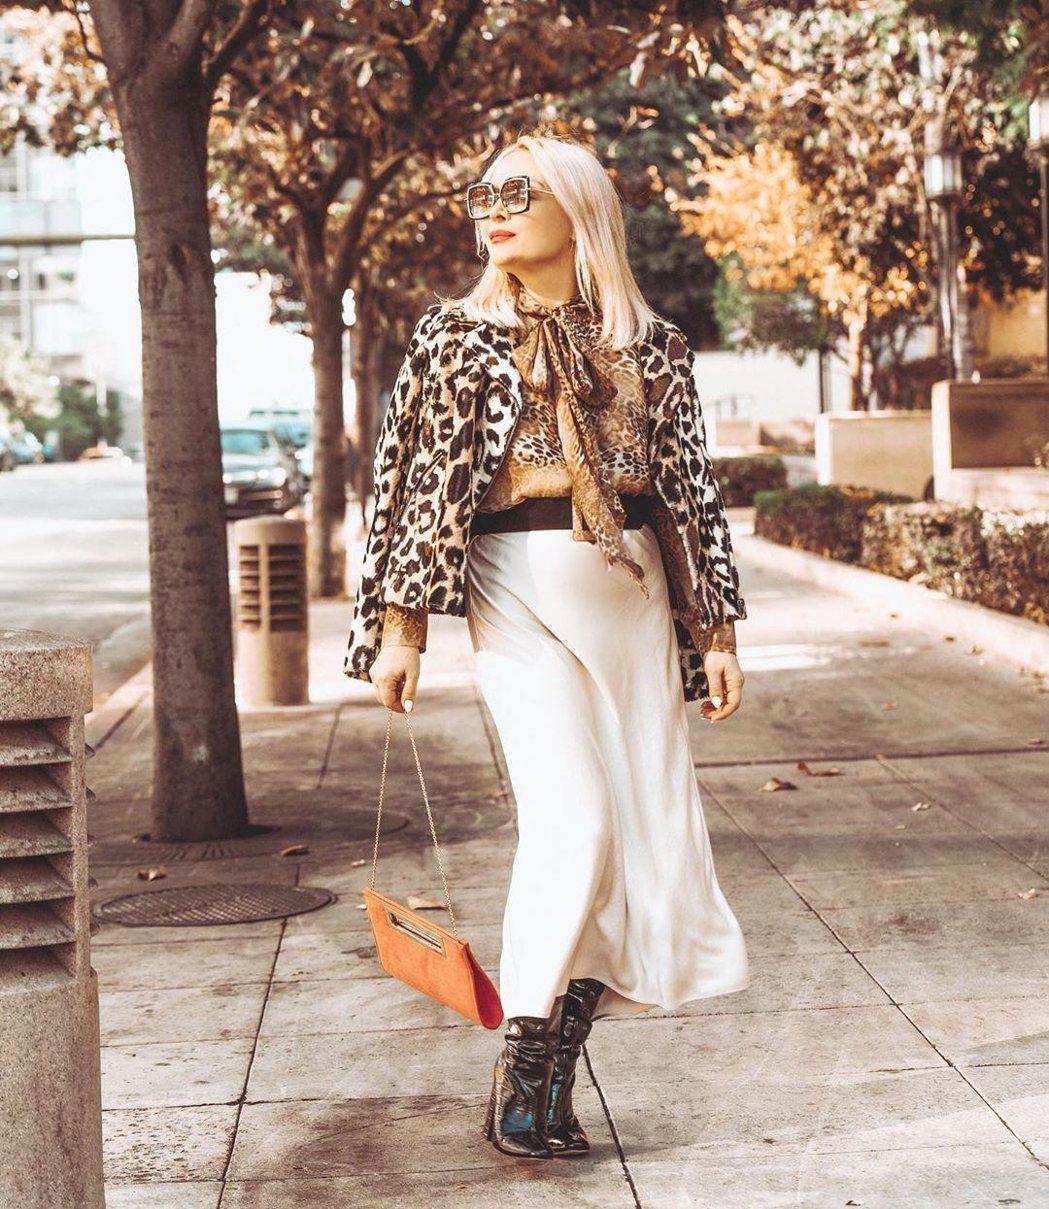 Zia Domic穿著PINKSELFIE豹紋雪紡長袖衫,漸層豹紋與蝴蝶結綁帶非...